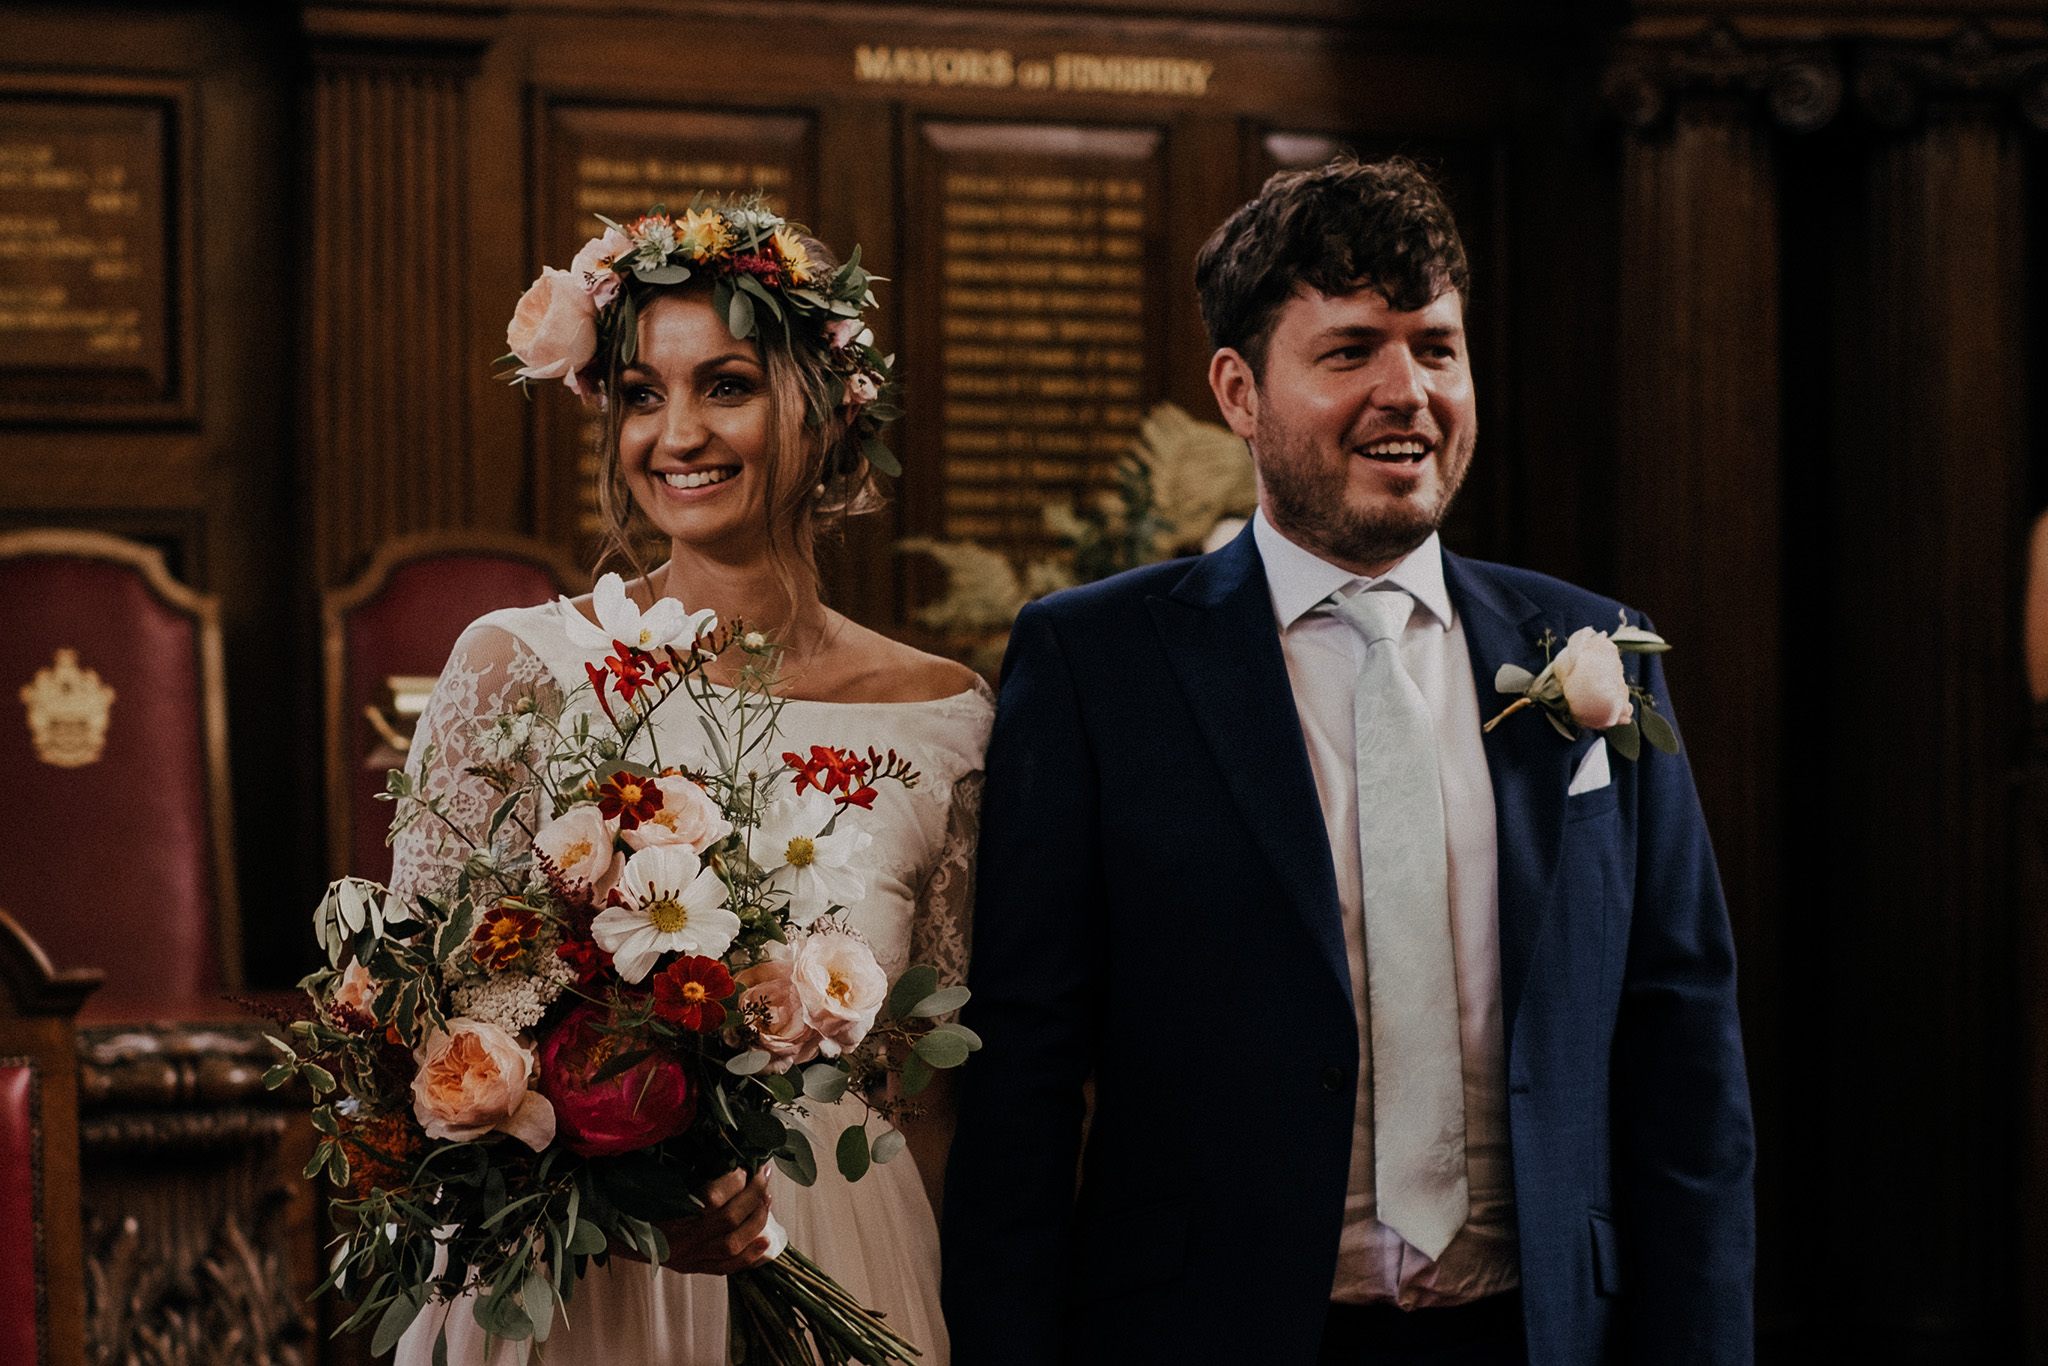 islington-town-hall-wedding-ceremony.jpg